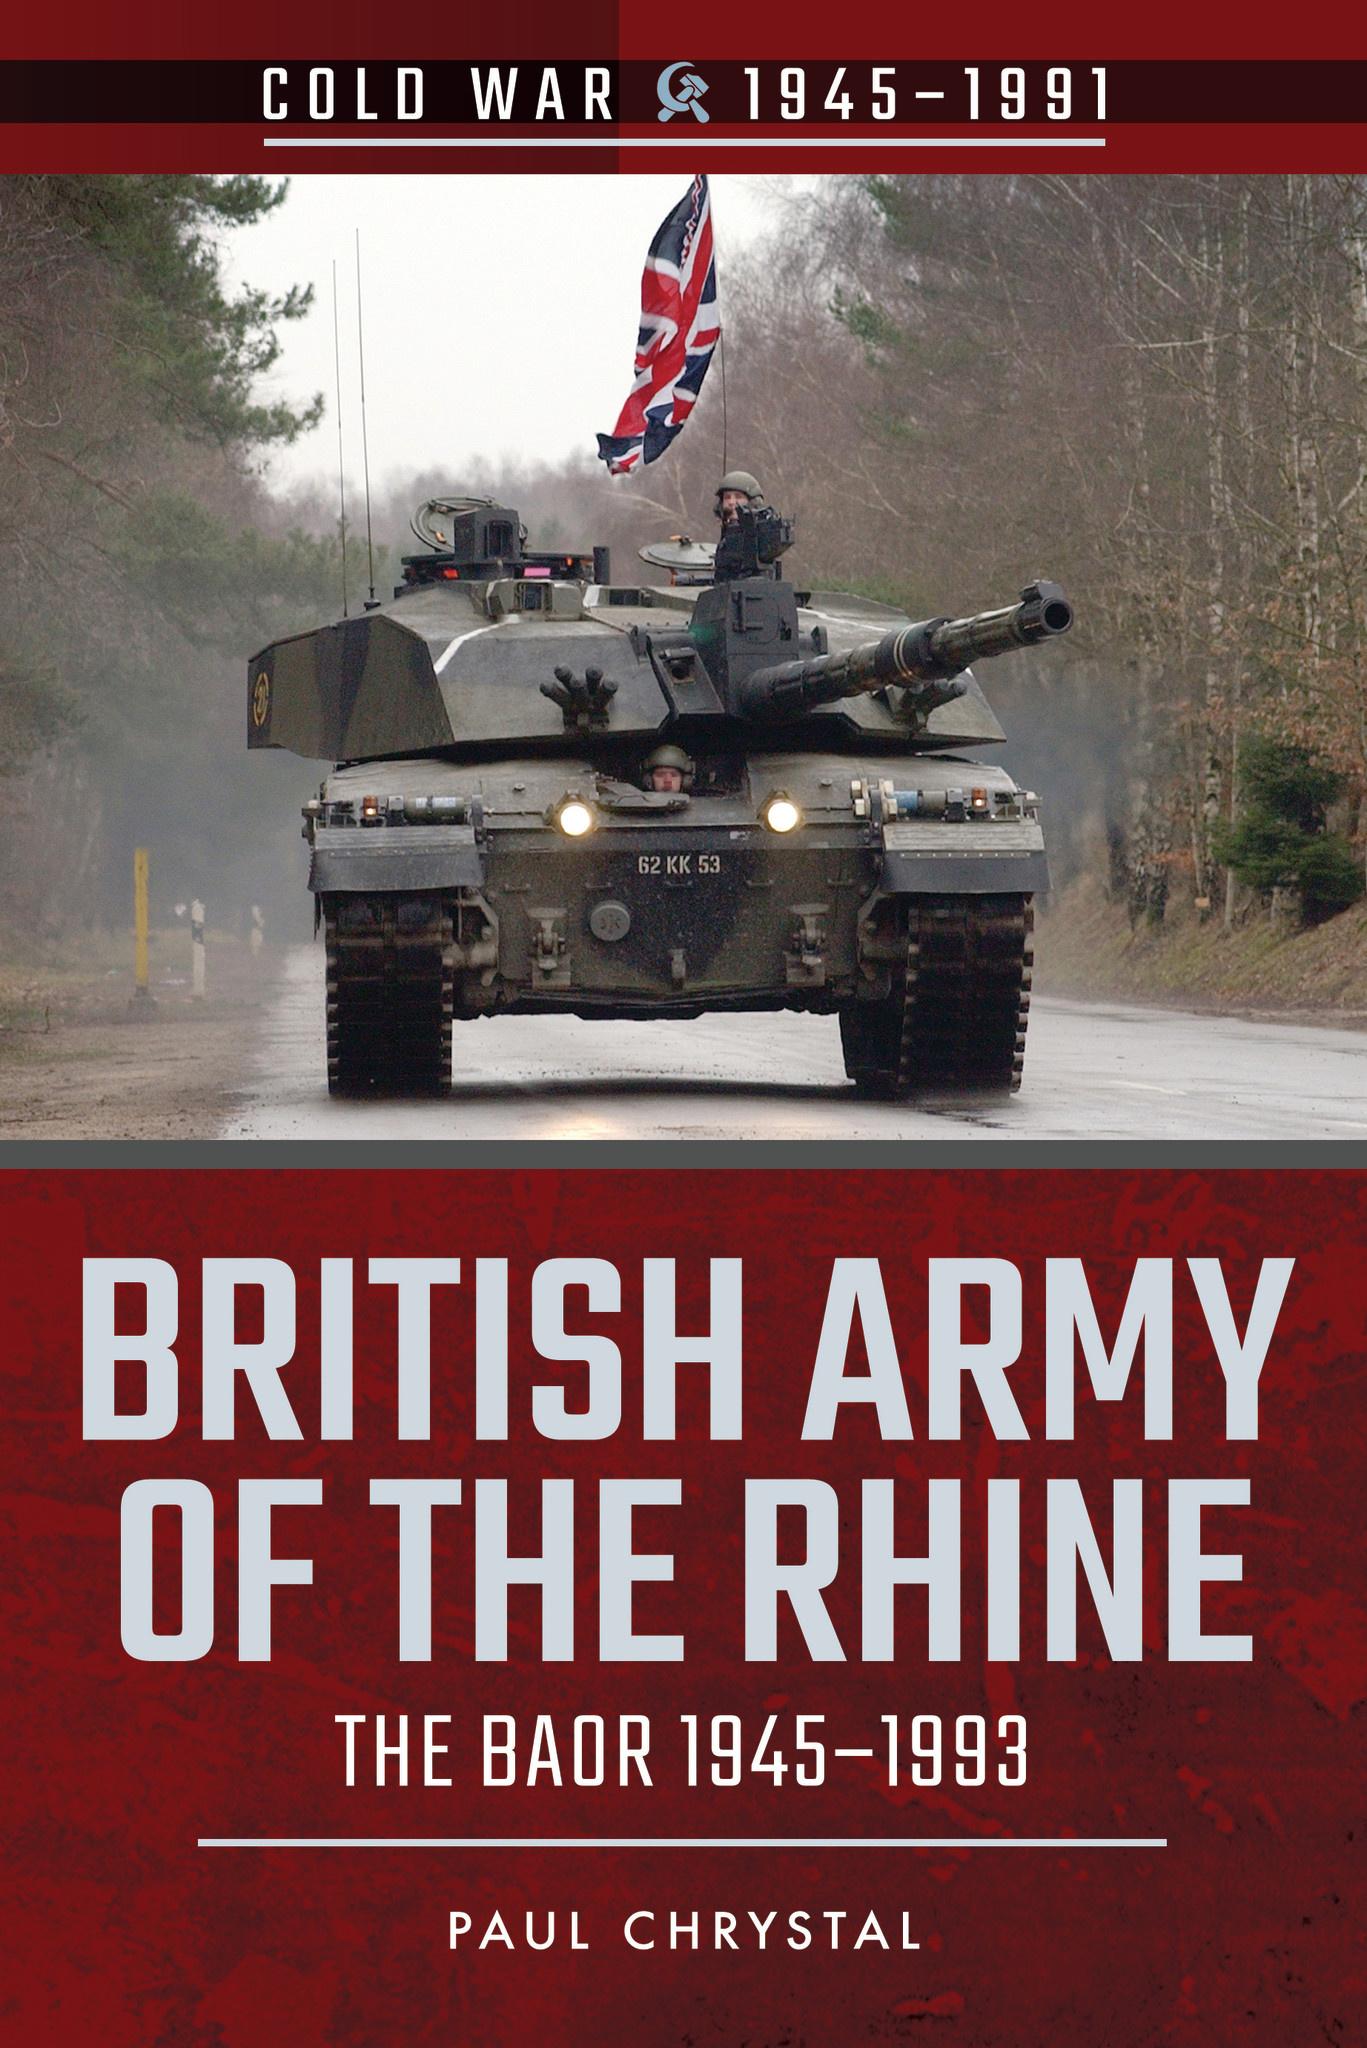 British Army of The Rhine - The BAOR Author Paul Chrystal